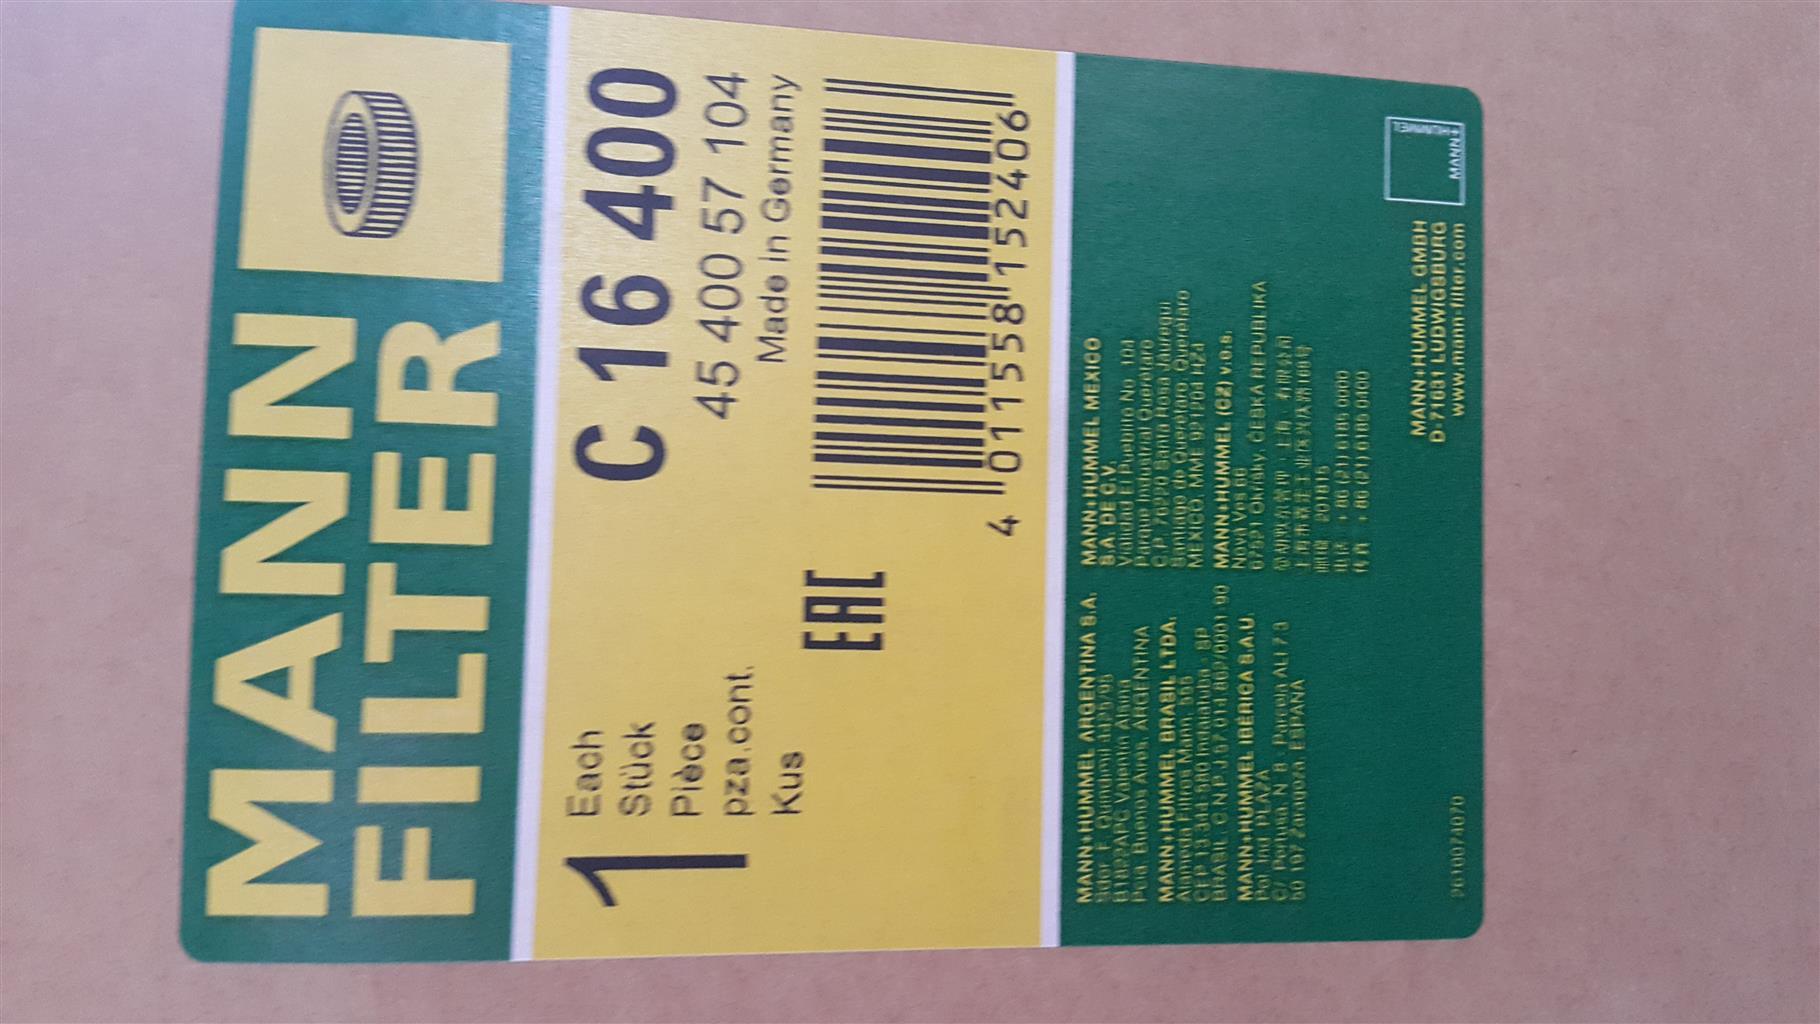 dc5cbec45fa Mann Hummel Air, Oil Filters, Spin On Separators and Drop In Separators